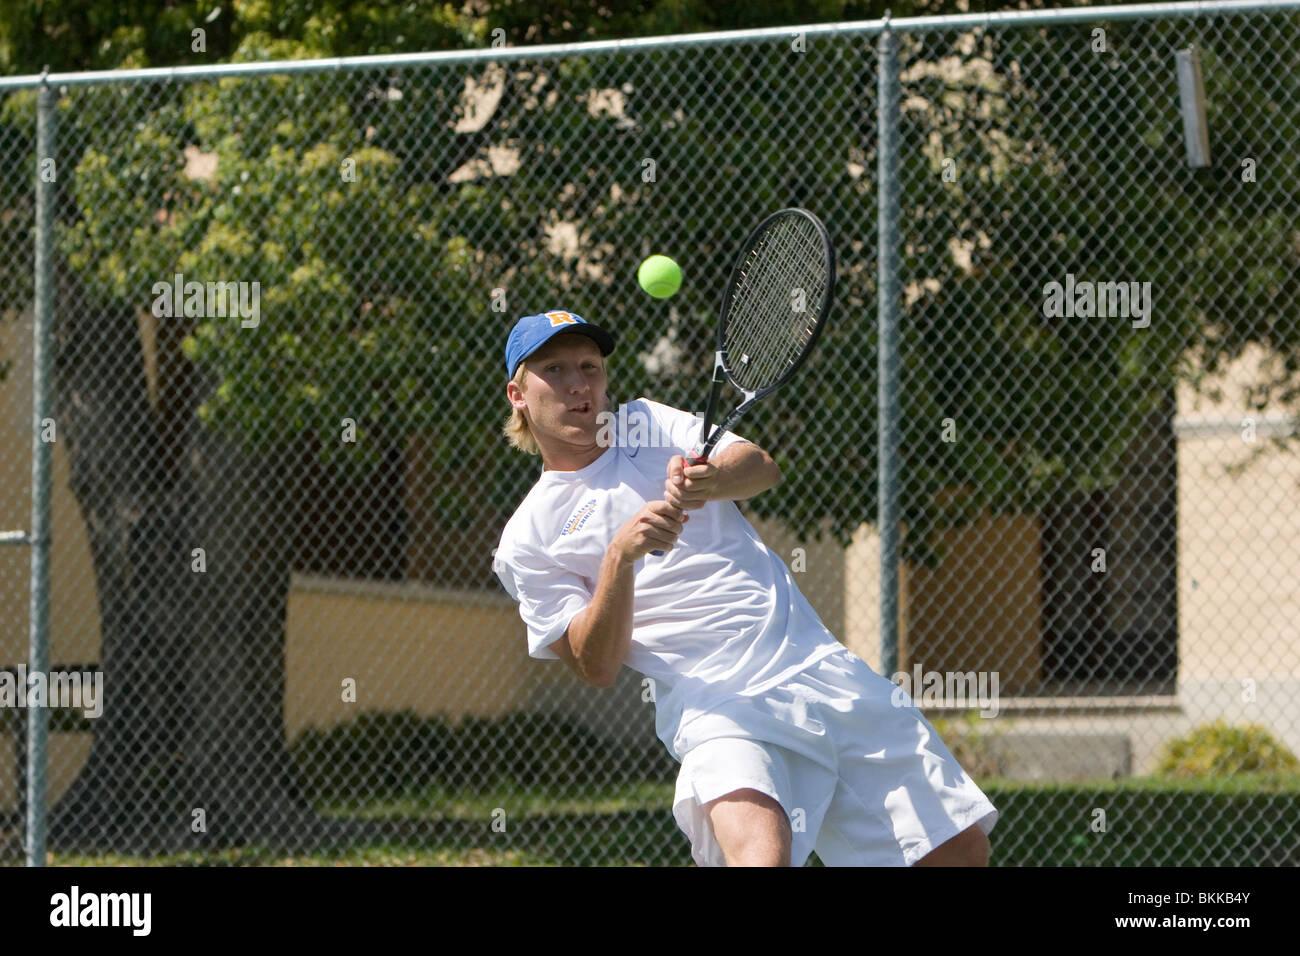 Men's tennis player hitting tennis ball - Stock Image